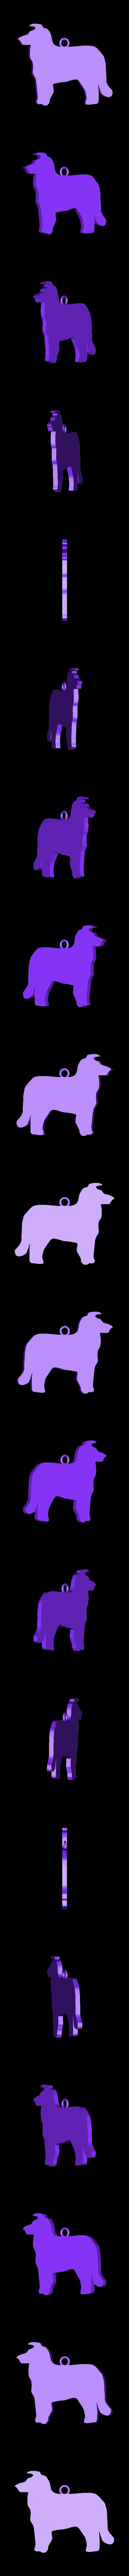 39.stl Download STL file Dogs • 3D printing object, GENNADI3313